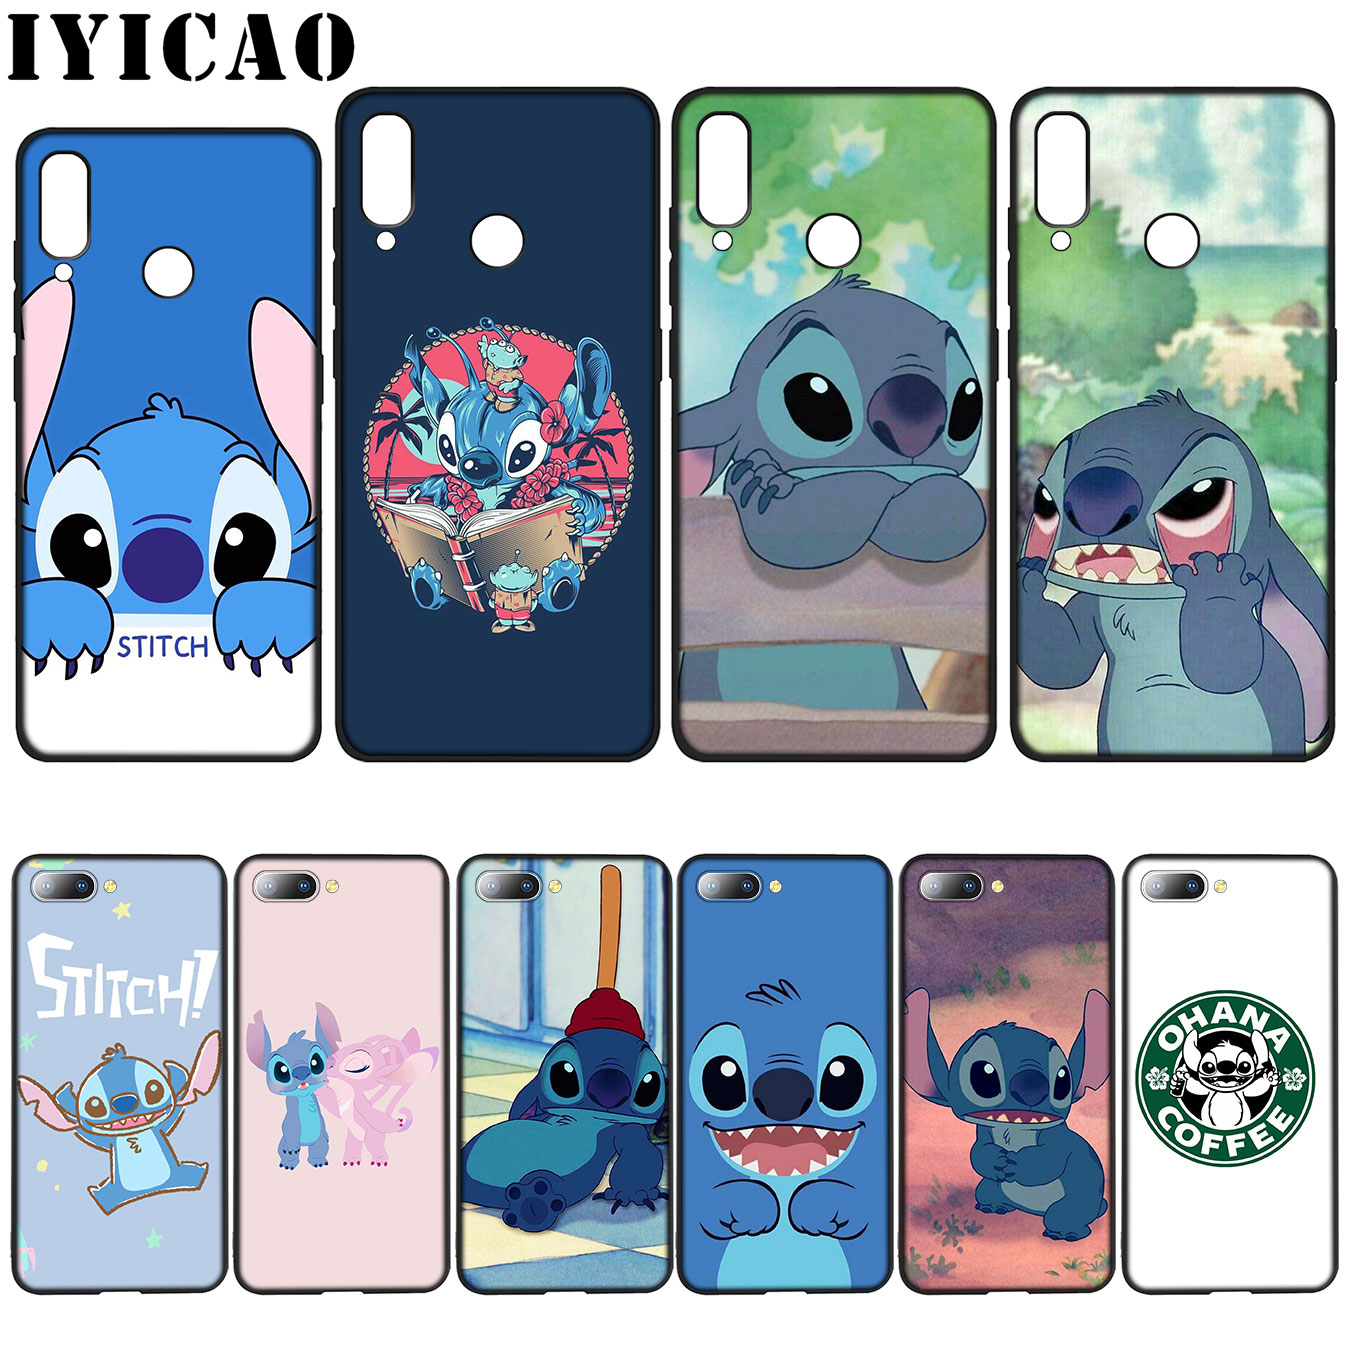 IYICAO cute cartoon Lilo Stitch Colorful Cute Soft Case for Huawei Y7 Y6 Prime Y9 2018 Honor 8C 8X 8 9 10 Lite 6A 7C 7X 7A Pro